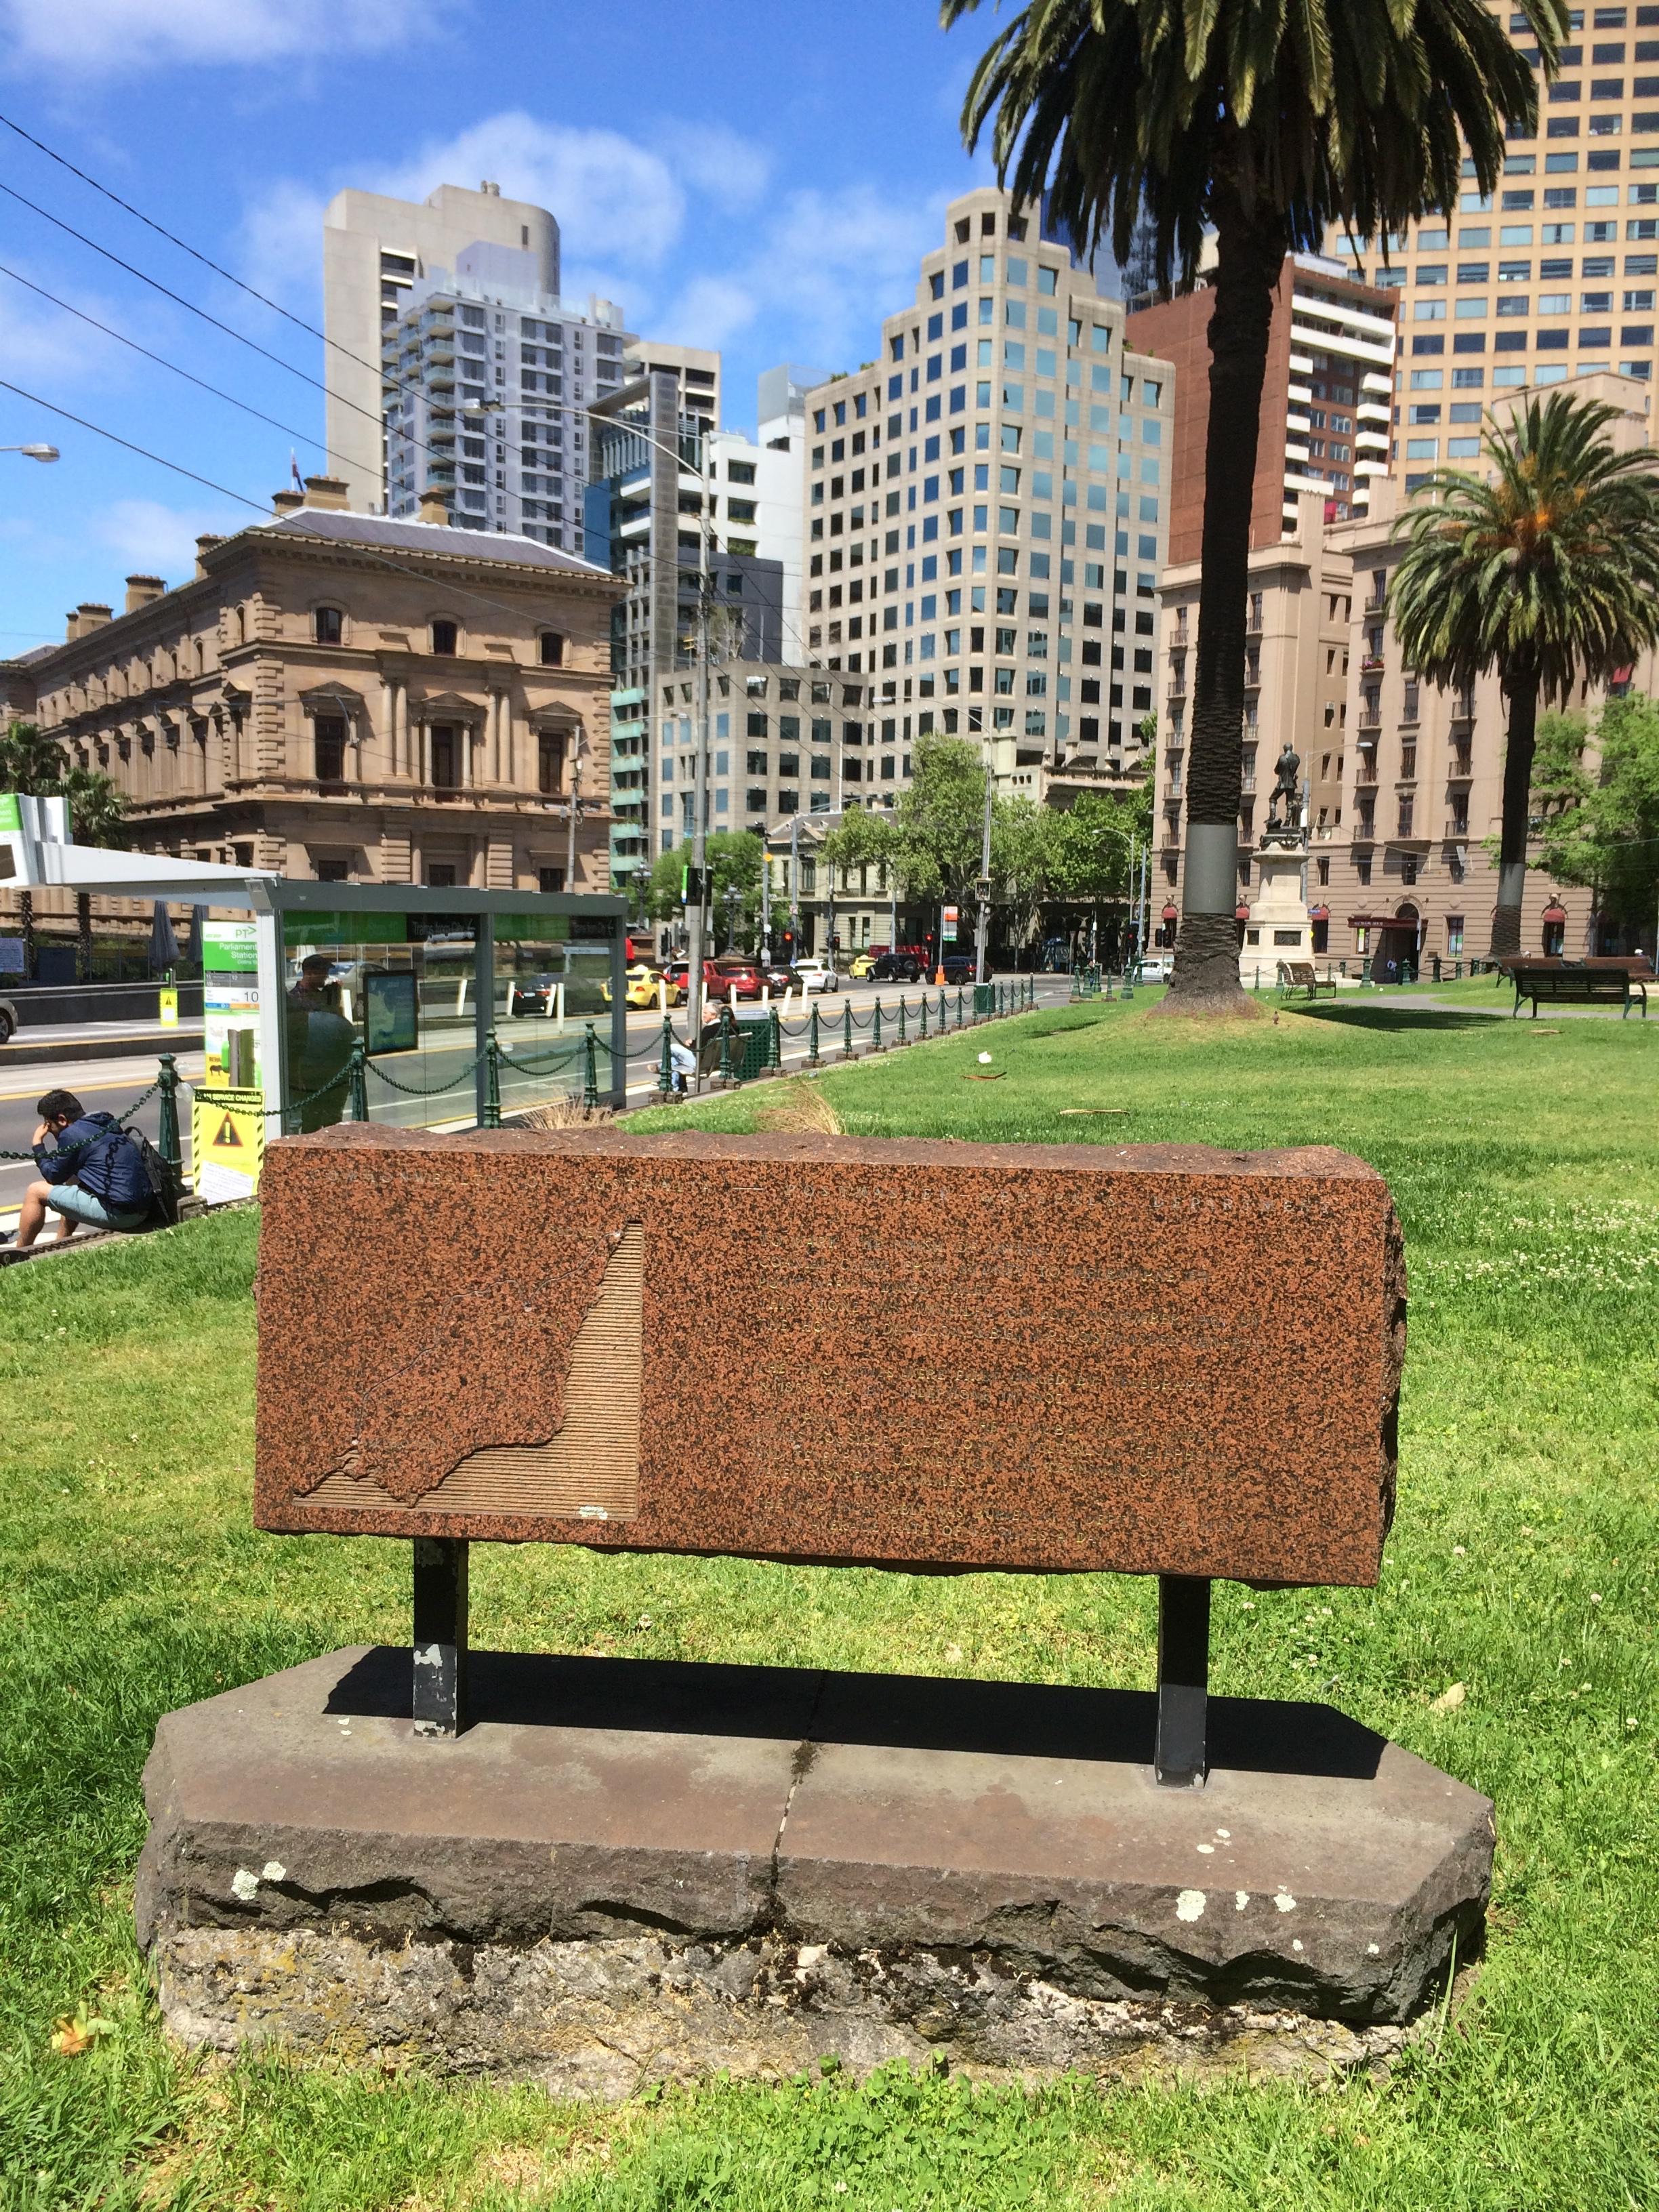 File:CoaxialCableMemorial GordonReserve Melbourne Environs